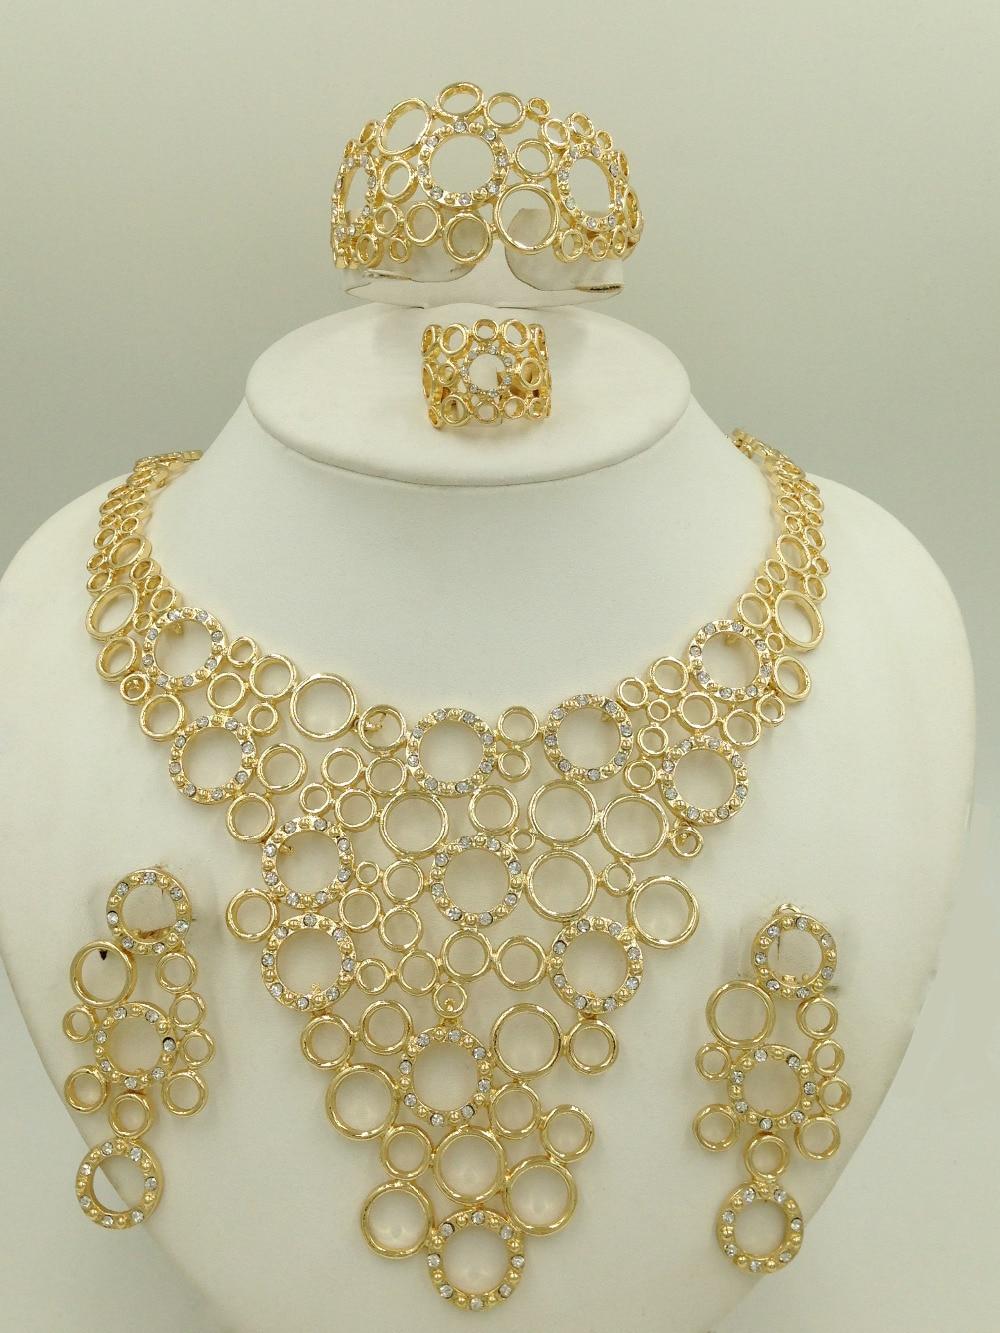 2015 New fashion African Dubai Costume 18k Gold Plated Jewelry ...